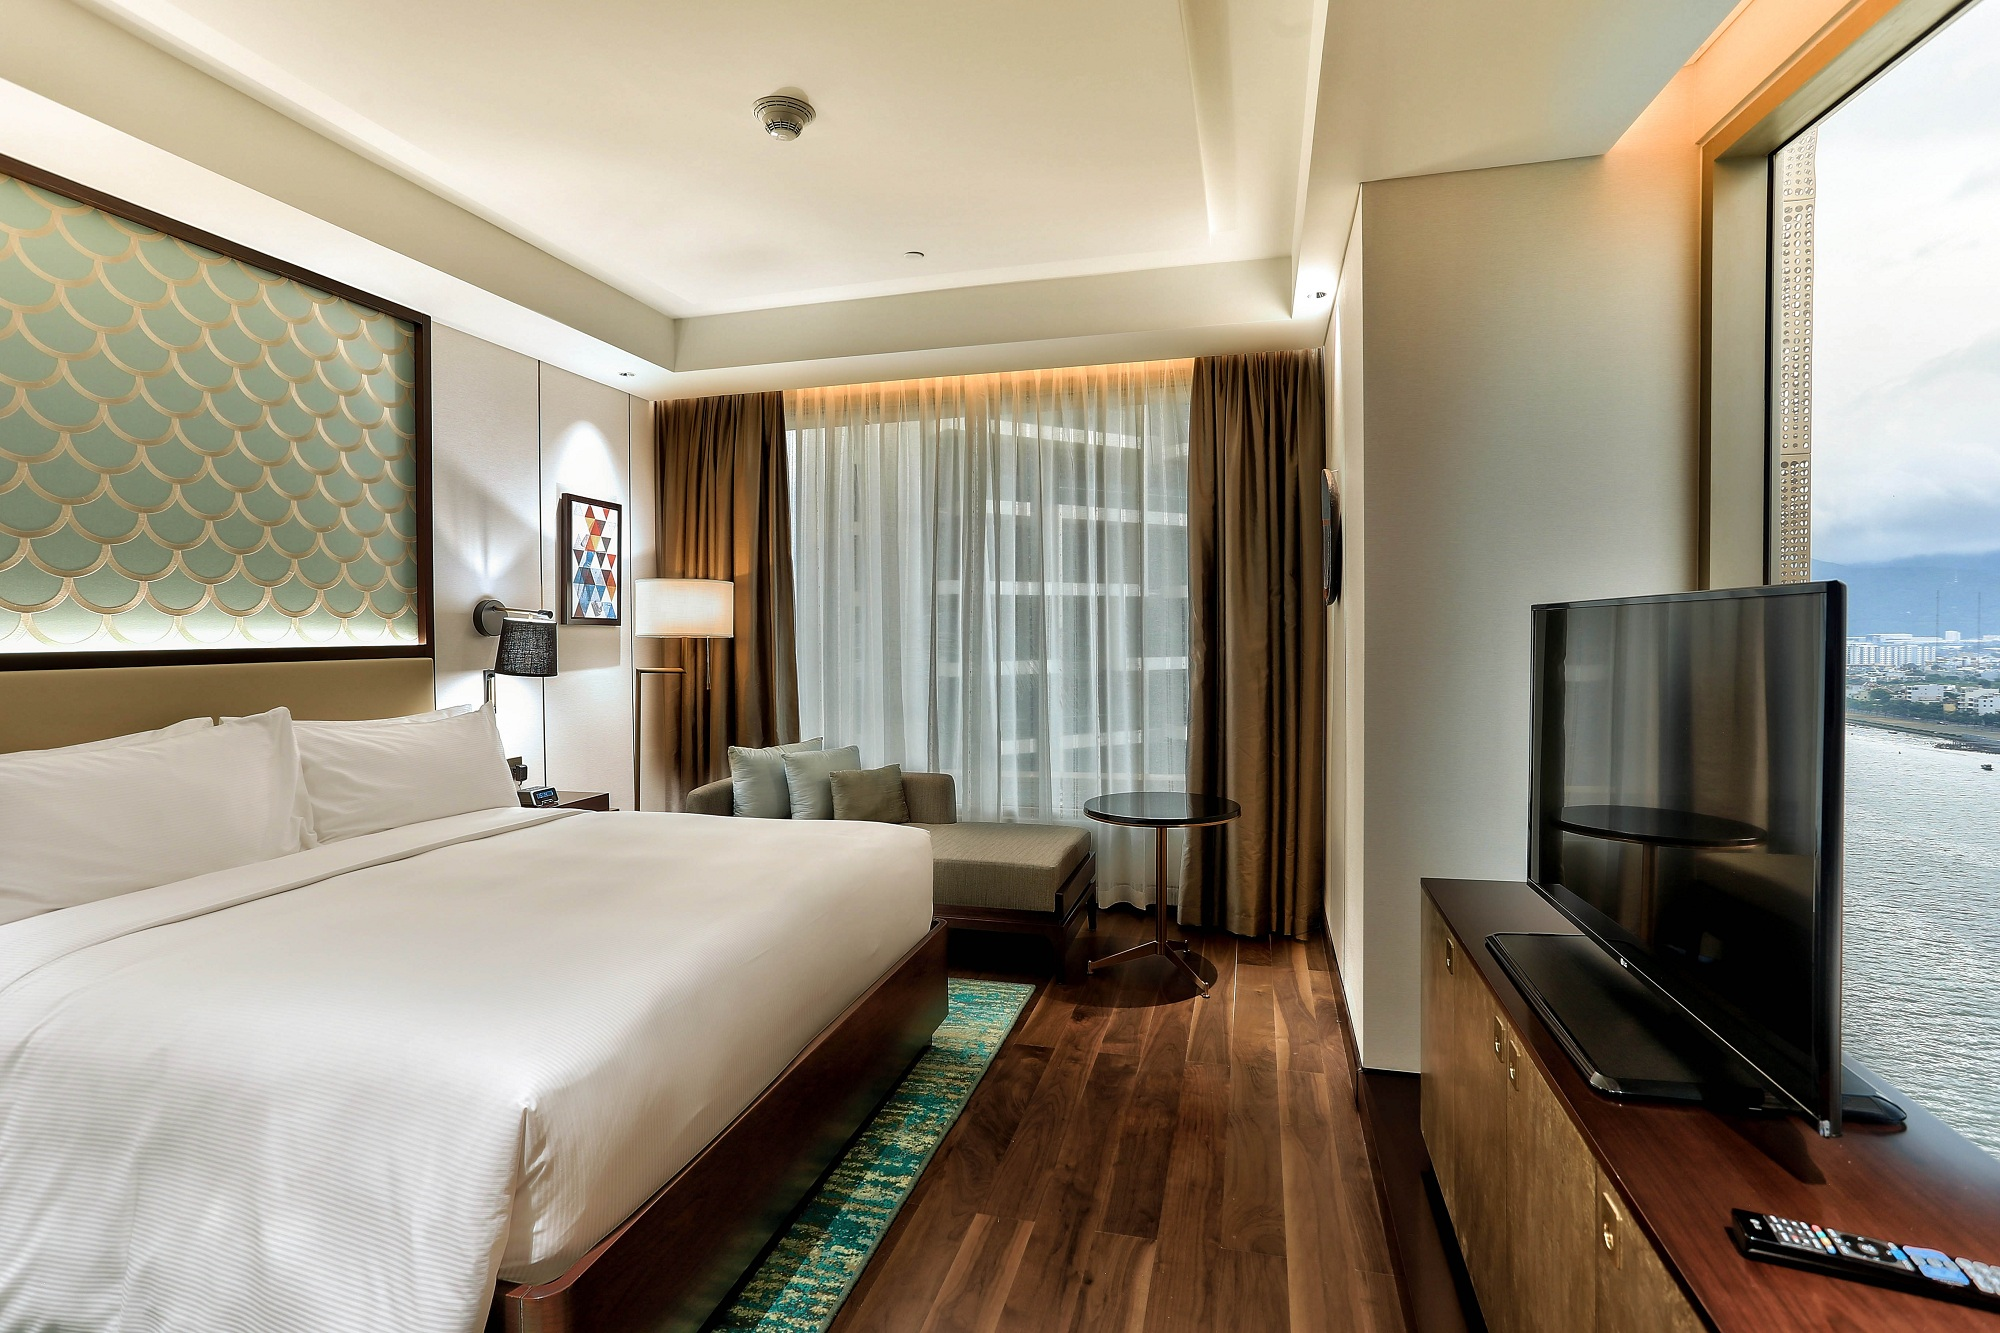 One Bedroom Suite River View Hilton Da Nang Trai Nghiem Khach San Day Phong Cach Giua Long Thanh Pho Danang Fantasticity